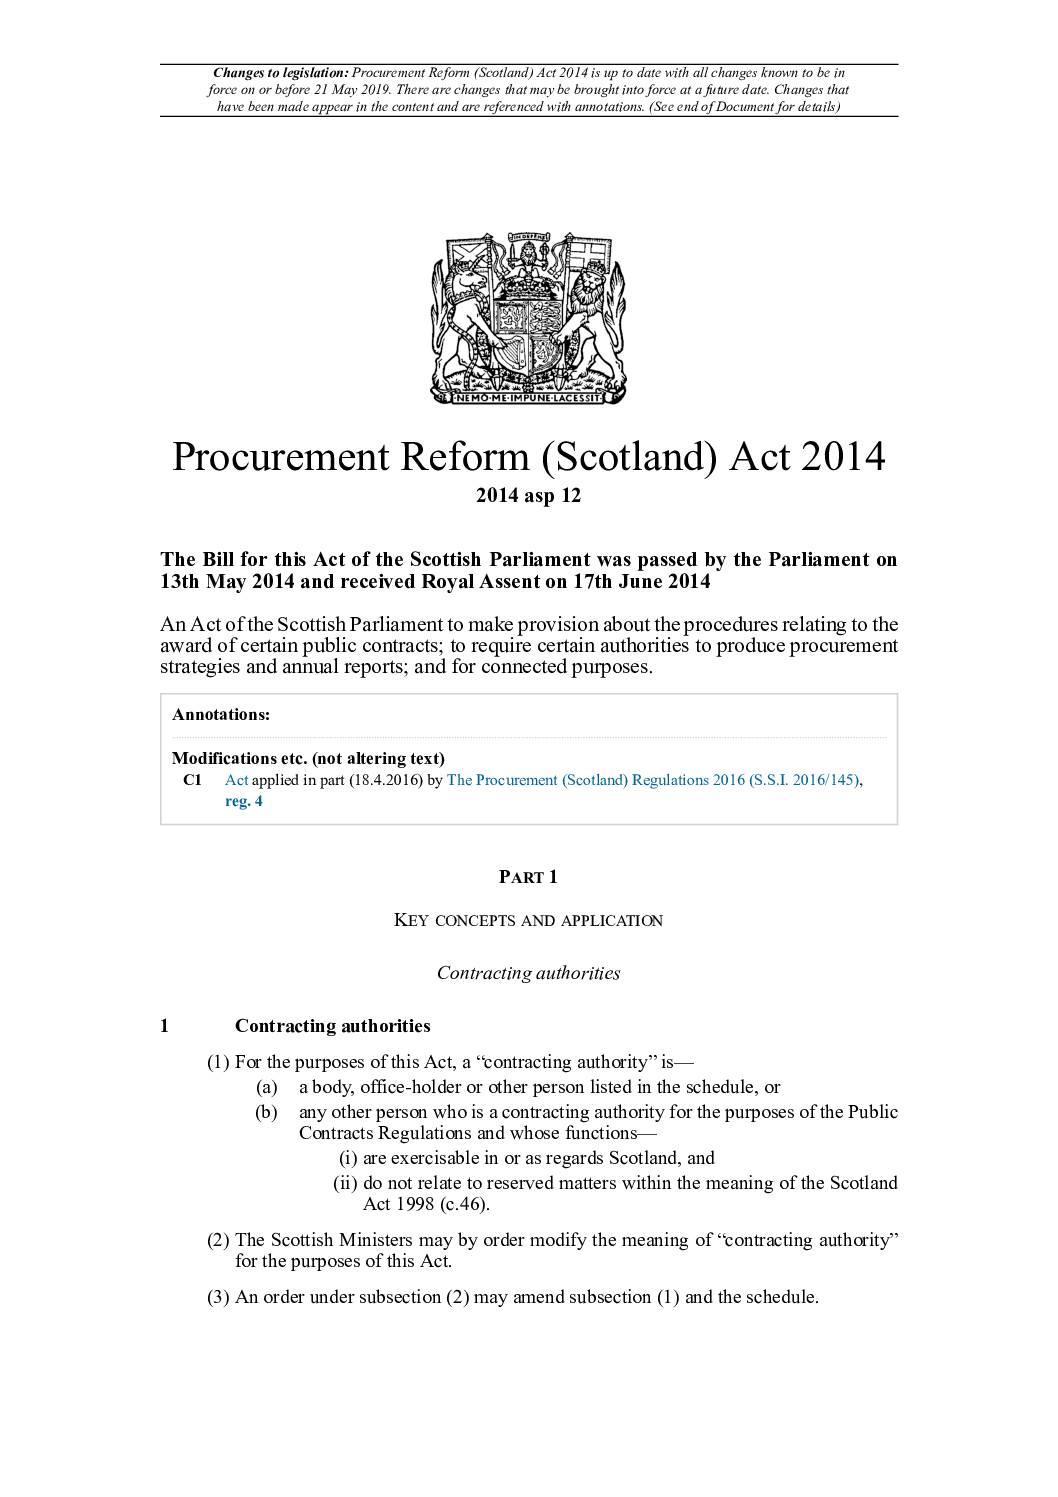 Scotland's Procurement Reform Act